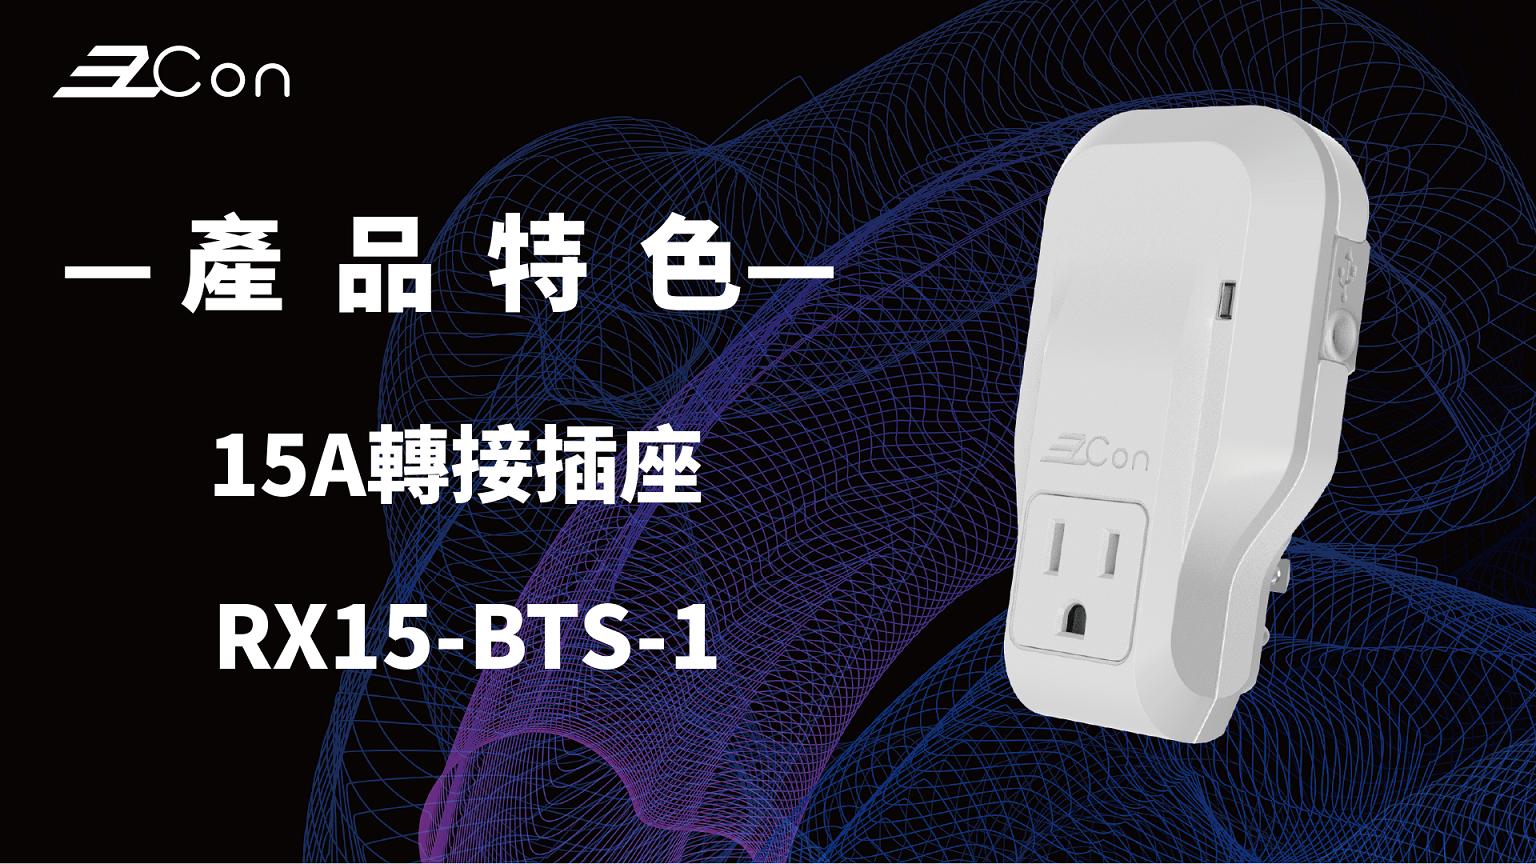 15A 转接插座 | RX15-BTS-1 | 产品特色 | EzCon